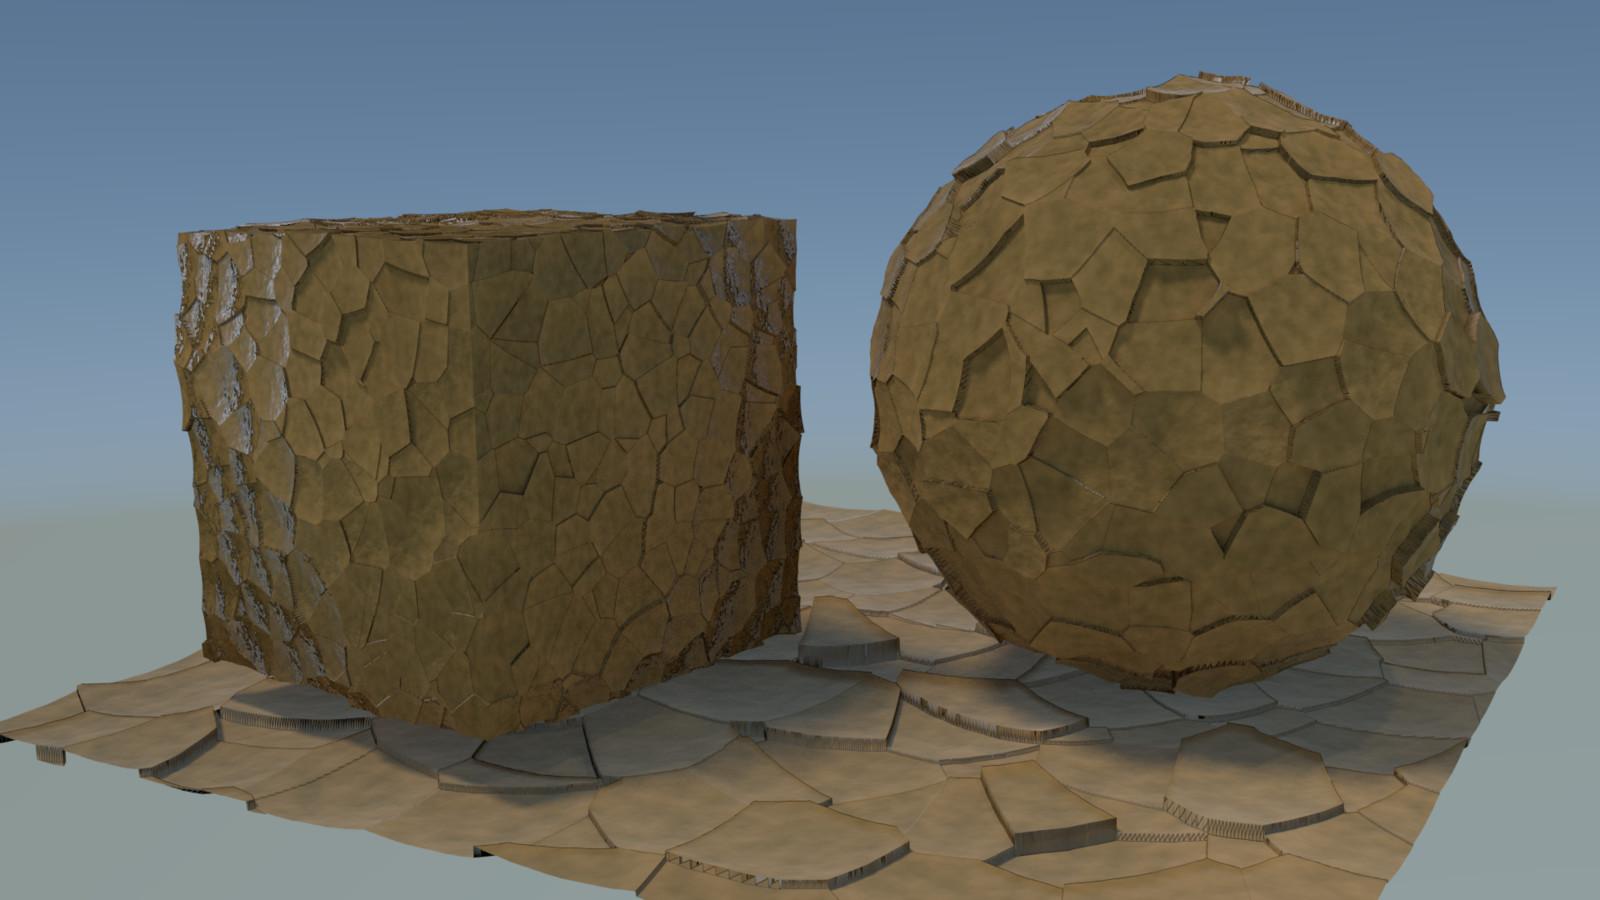 first render; much darker and more displacement.